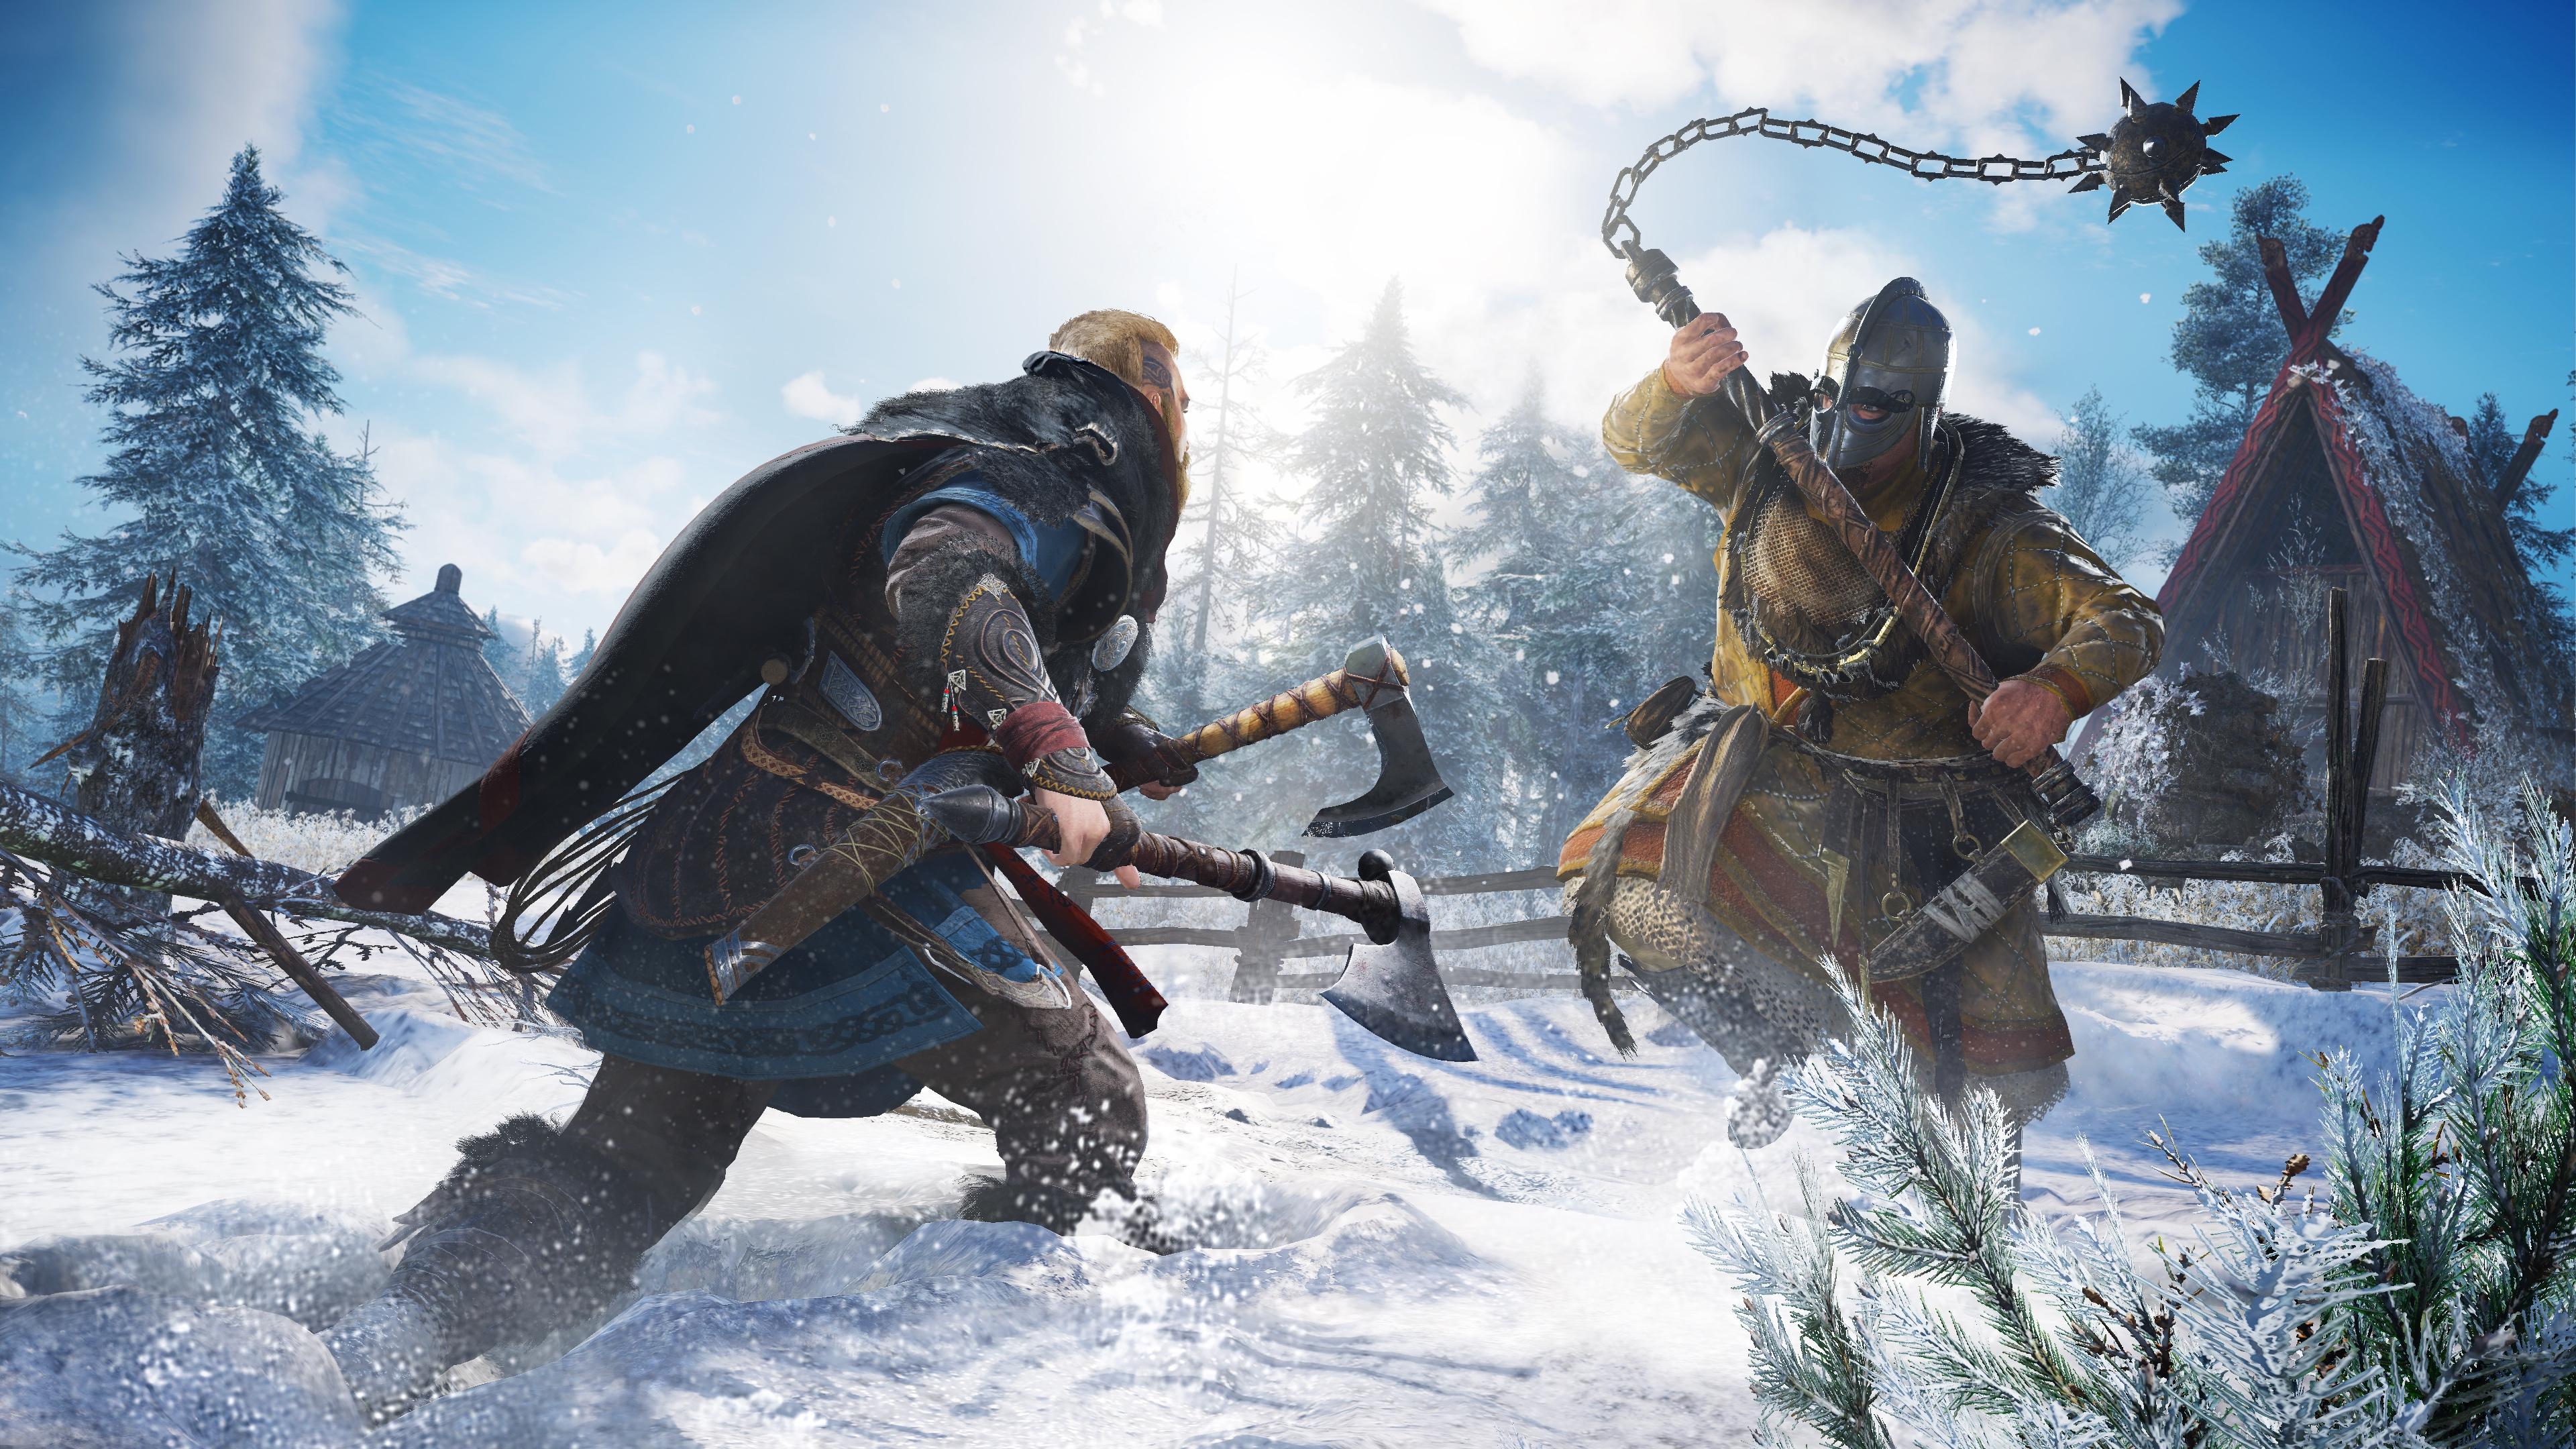 Viking raider Eivor battles an enemy warrior in a snowy setting from Assassin's Creed Valhalla